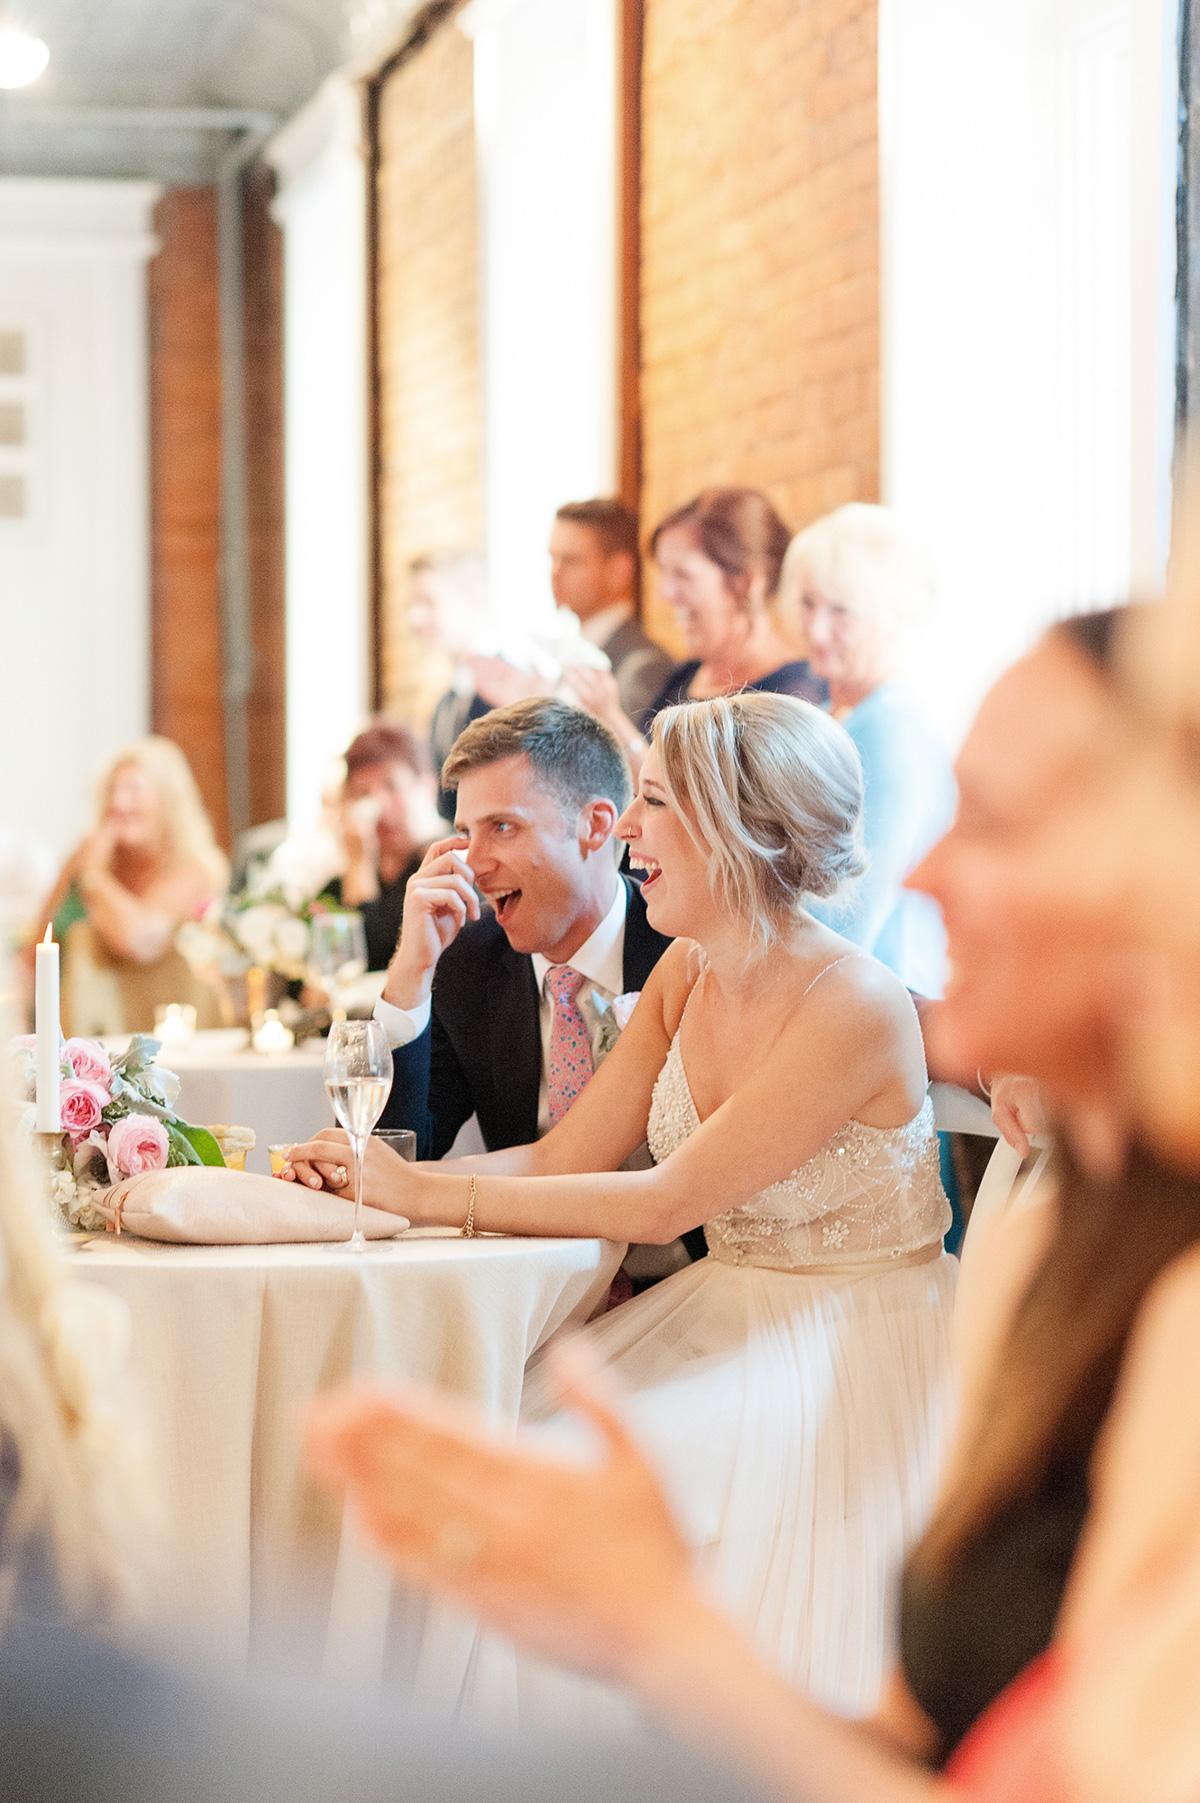 jennifer-xu-photography-vineyard-bride-swish-list-spice-factory-hamilton-wedding-47.jpg